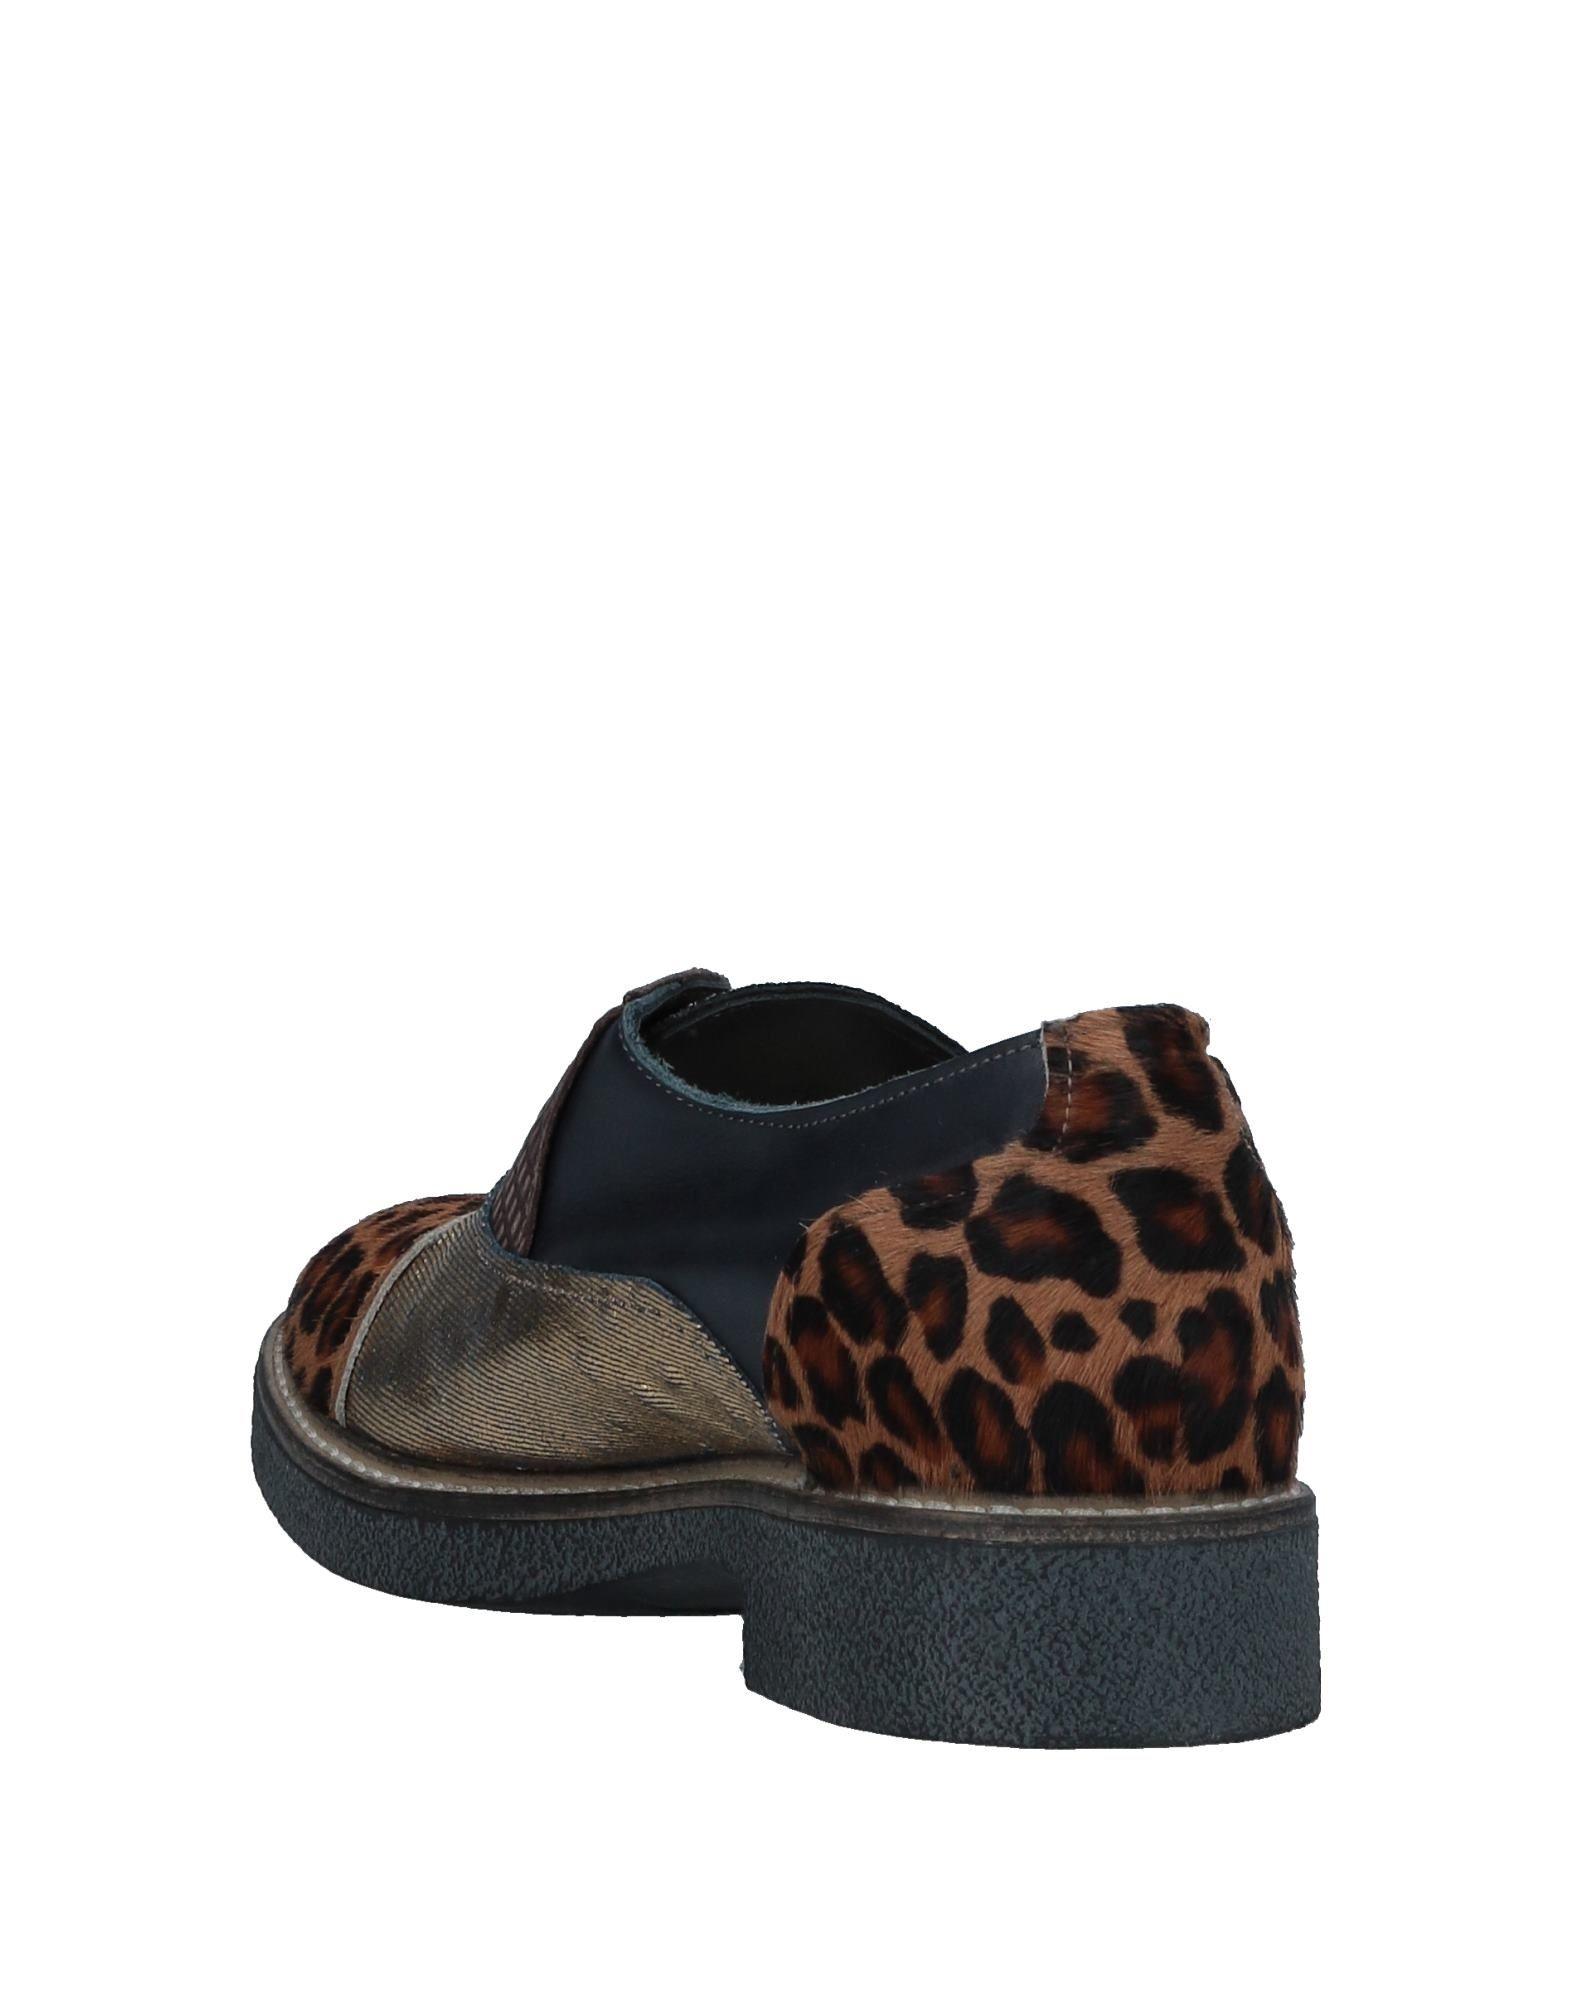 Rabatt Ebarrito echte Schuhe Ebarrito Rabatt Mokassins Herren  11521296IB c66e8b